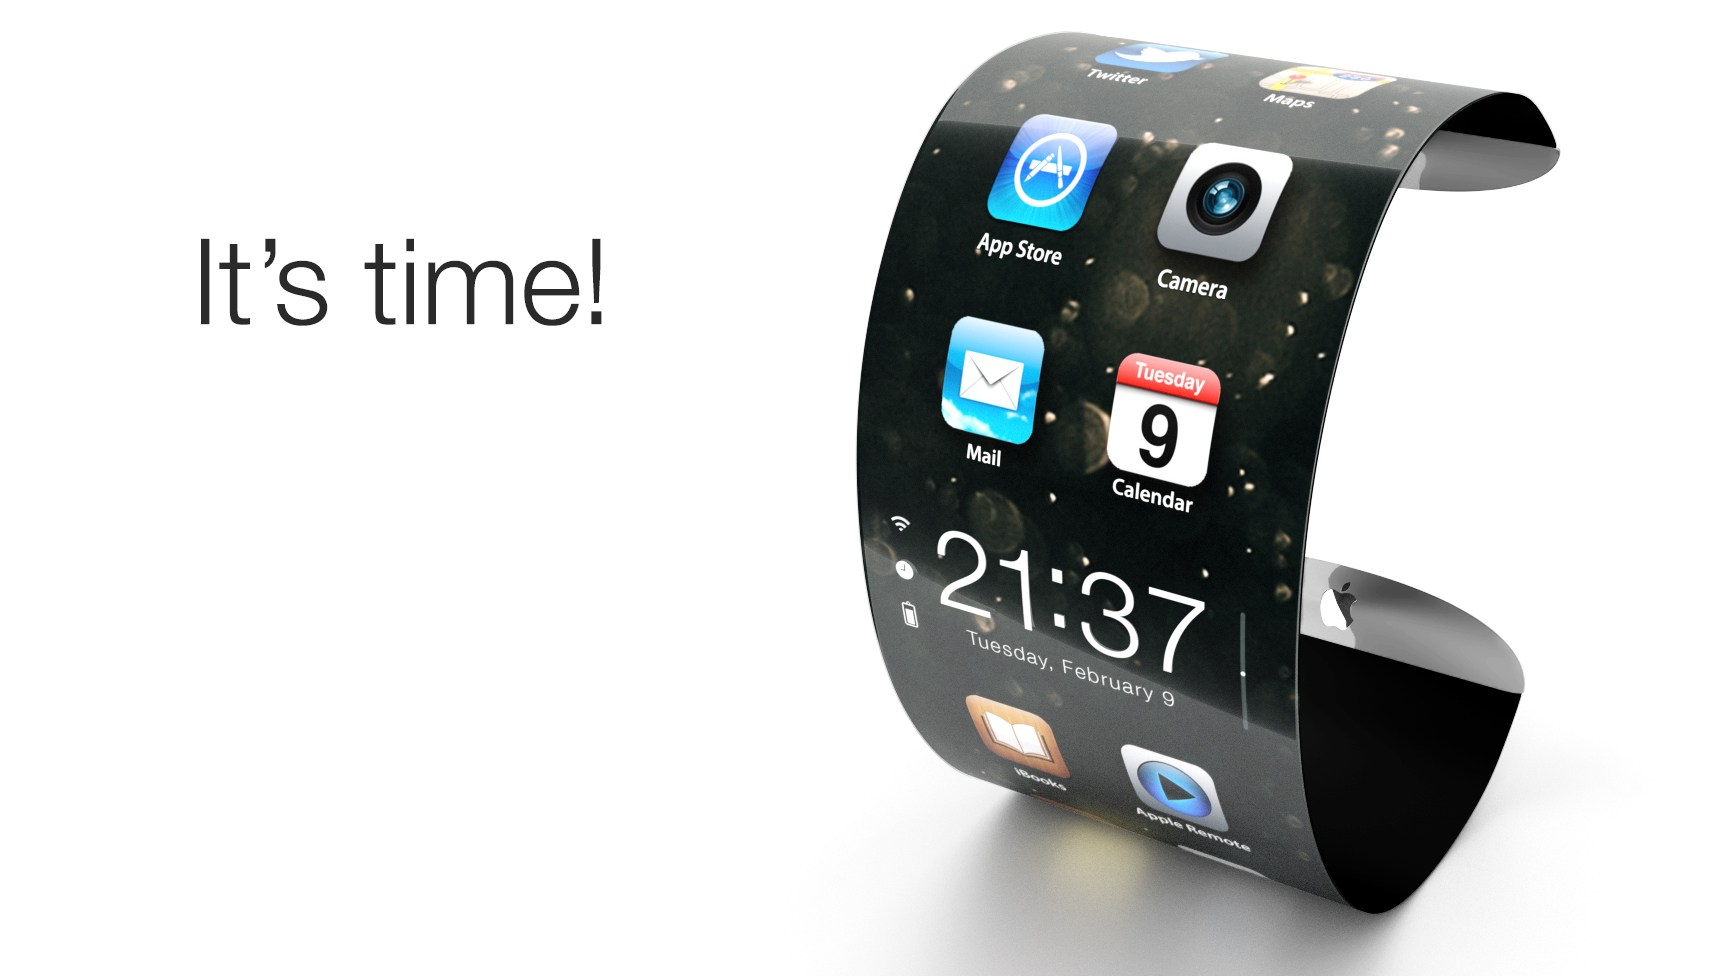 iPhone saranno pieghevoli